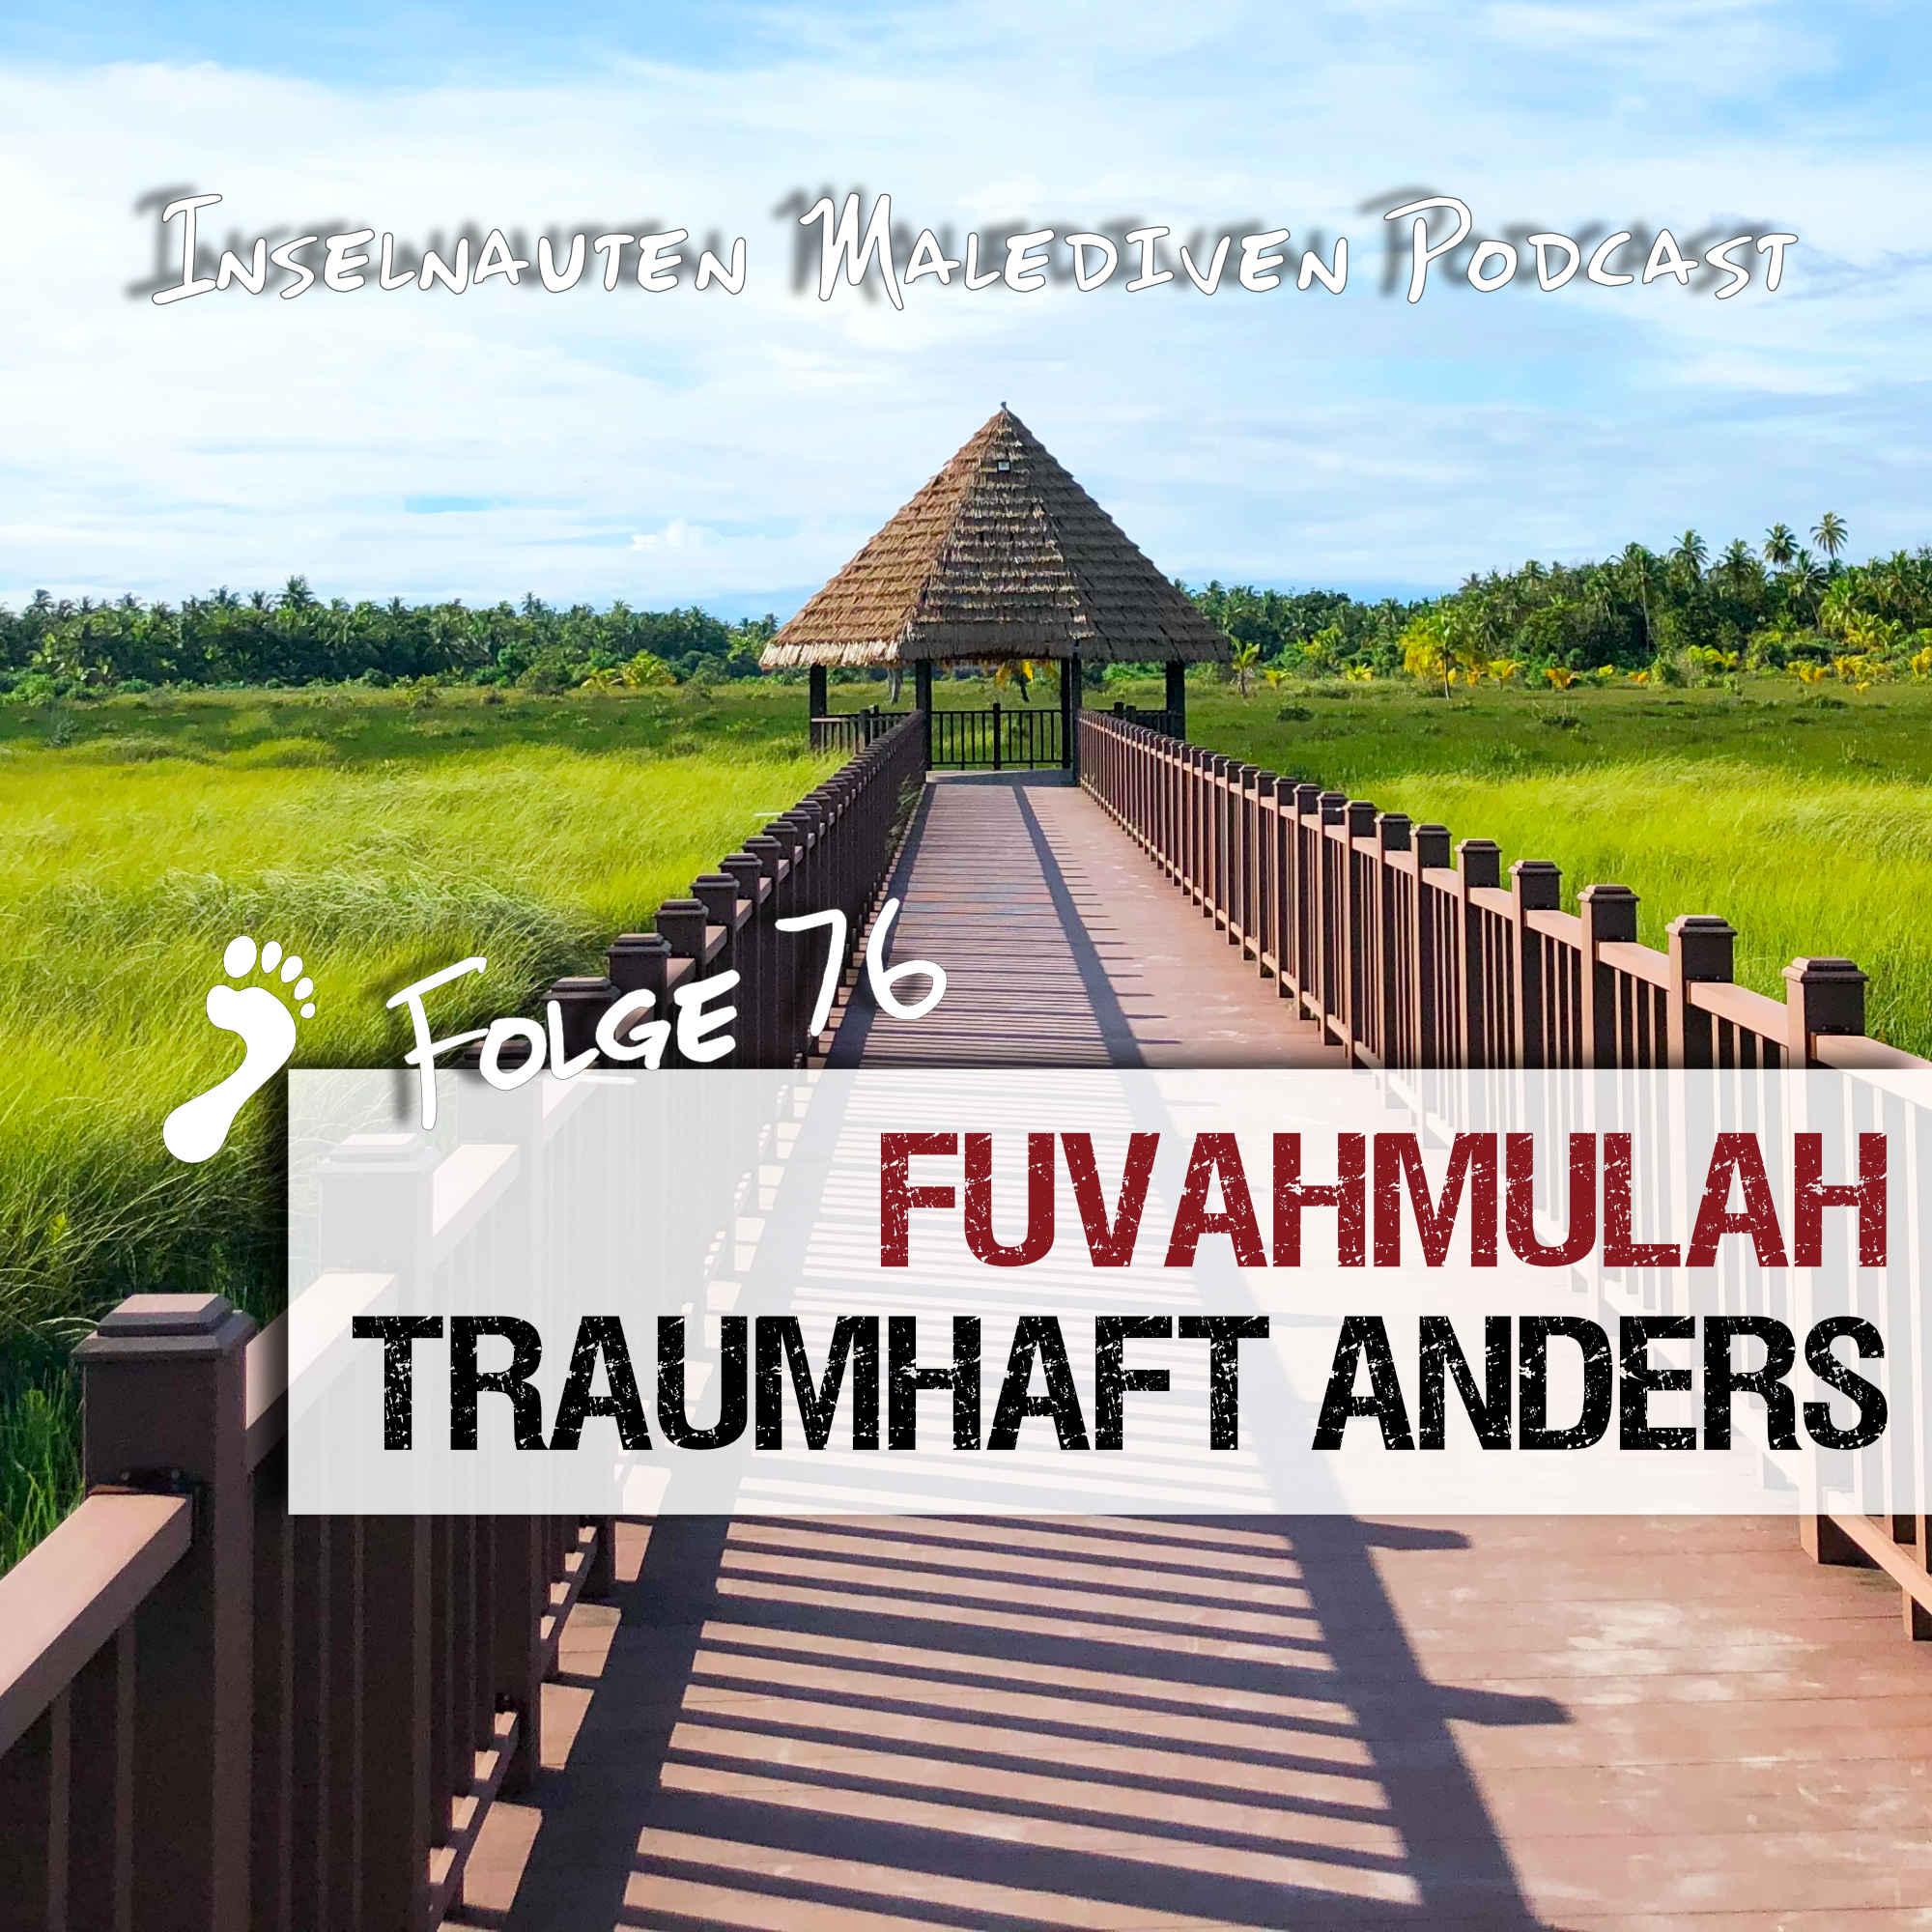 Fuvahmulah Malediven Podcast